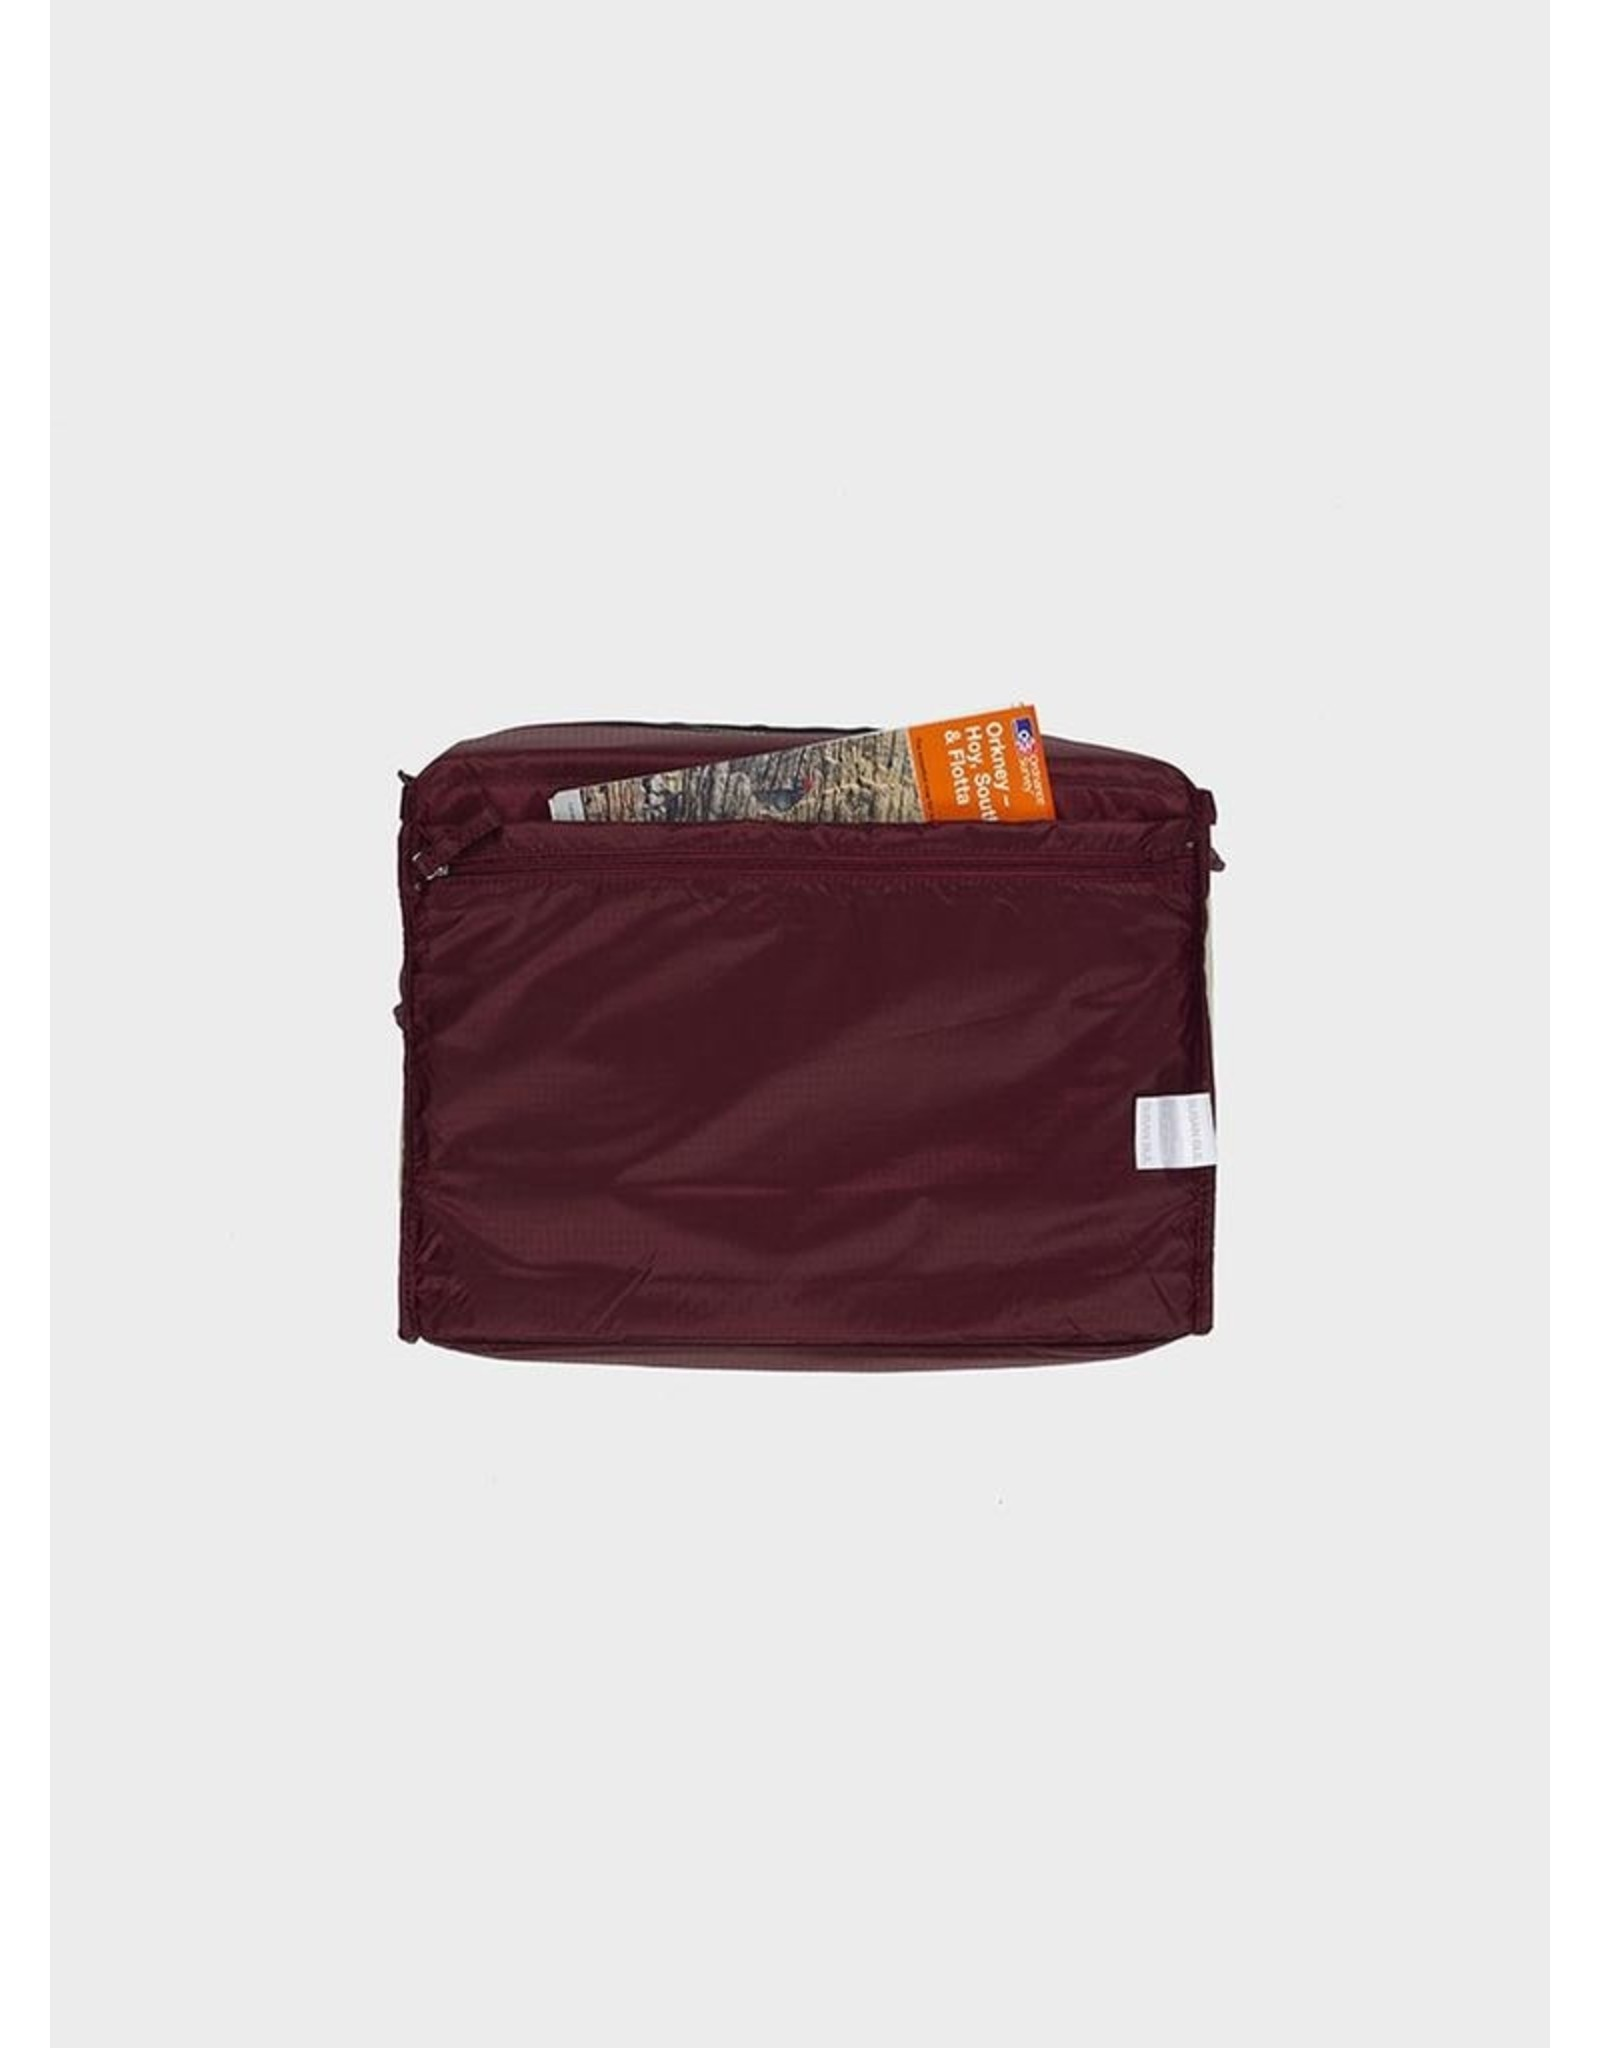 Susan Bijl 24/7 Bag - Pistachio & Burgundy - Overnight bag - 39,5 x 18 x 28 cm - 20l - Waterproof